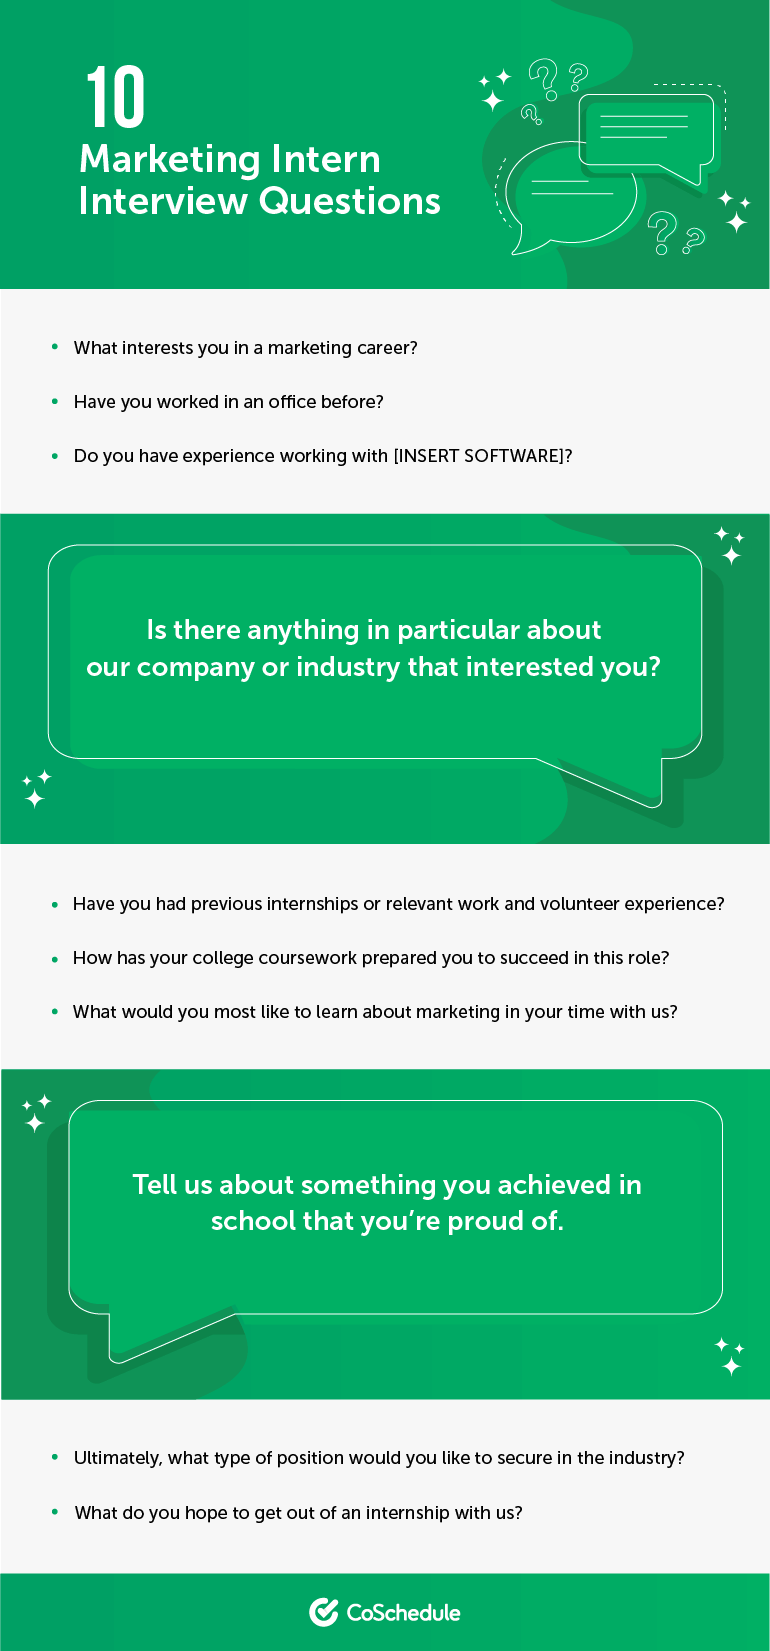 10 Marketing Intern Interview Questions